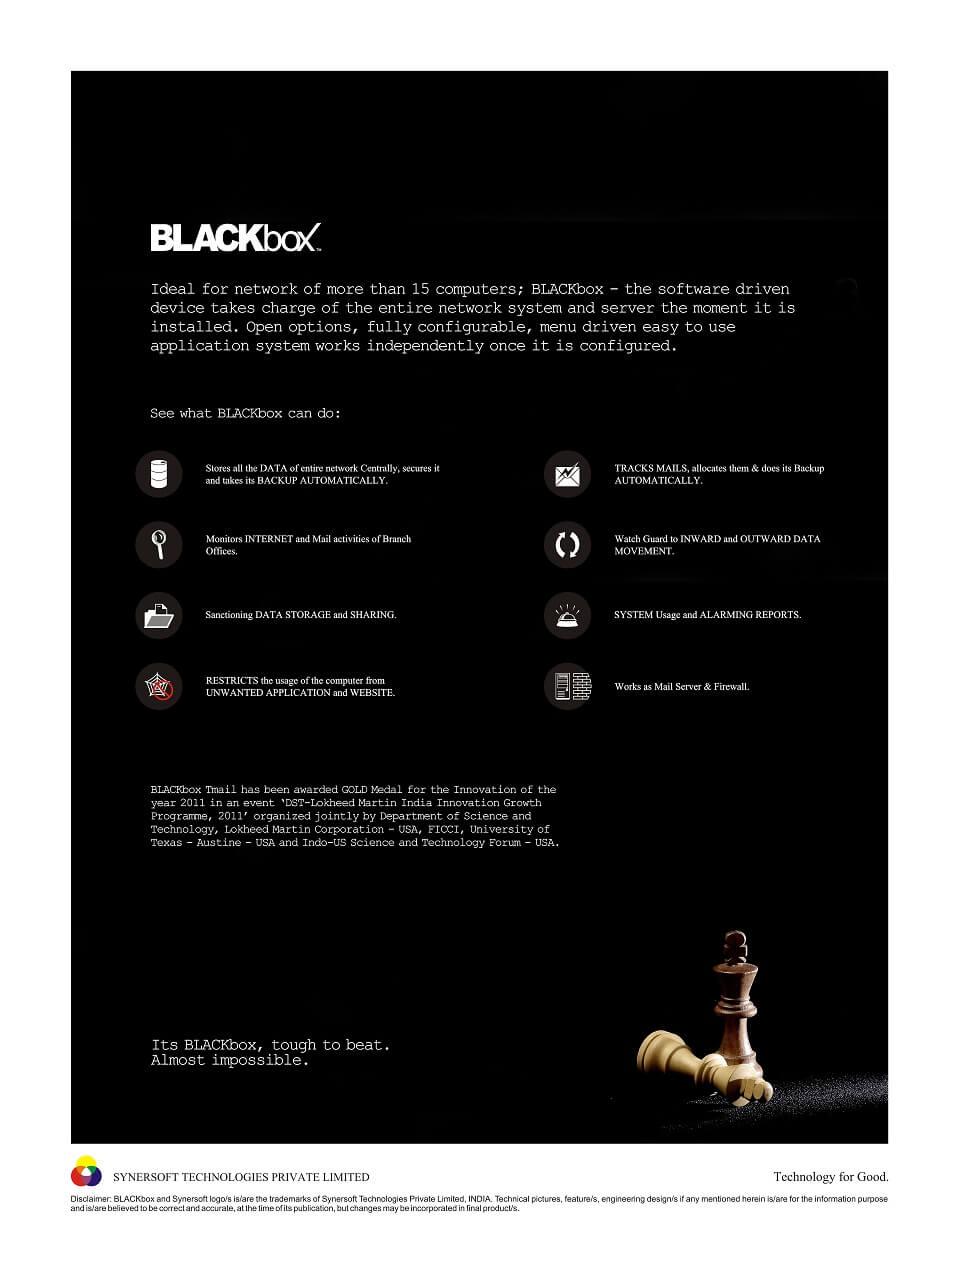 blackbox-conc-fortune-oct2011-insidebackcover